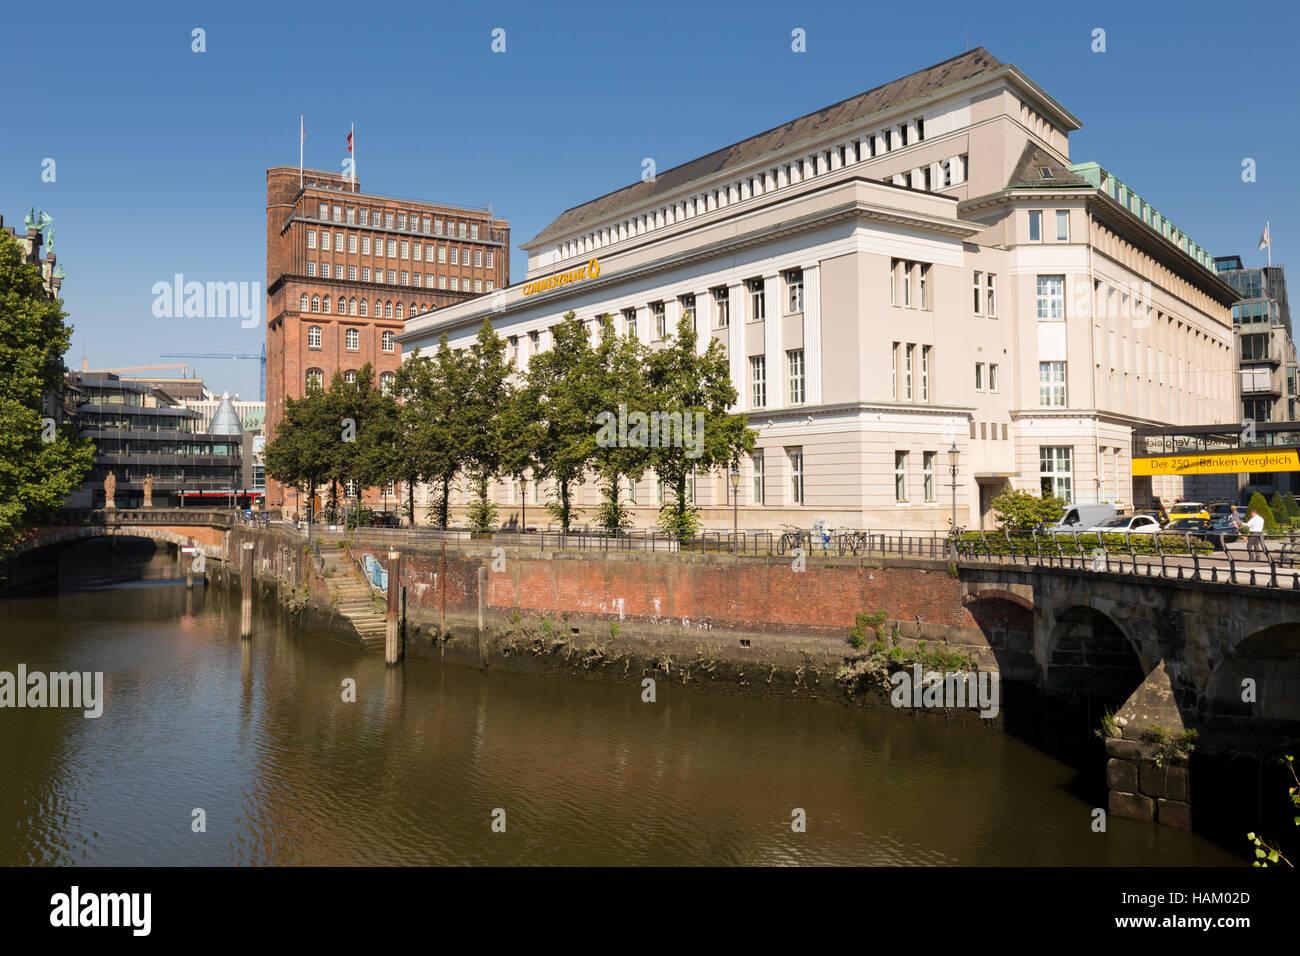 Hamburg Germany, Duitslan, bei der Allen Borse, Duitsland, Comerzbank - Stock Image